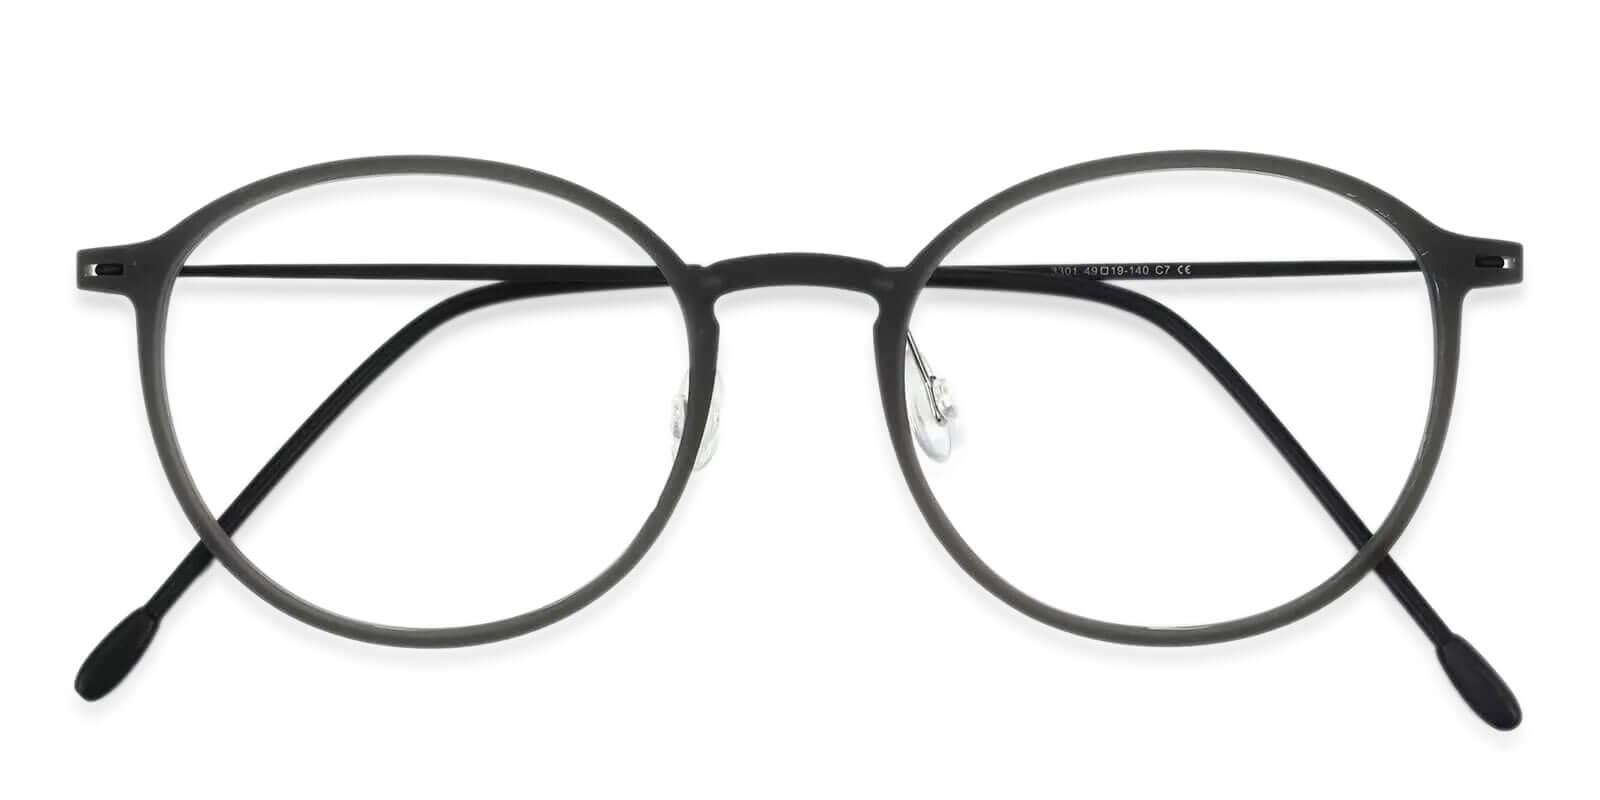 Yoga Gray Combination NosePads , Eyeglasses , Lightweight Frames from ABBE Glasses